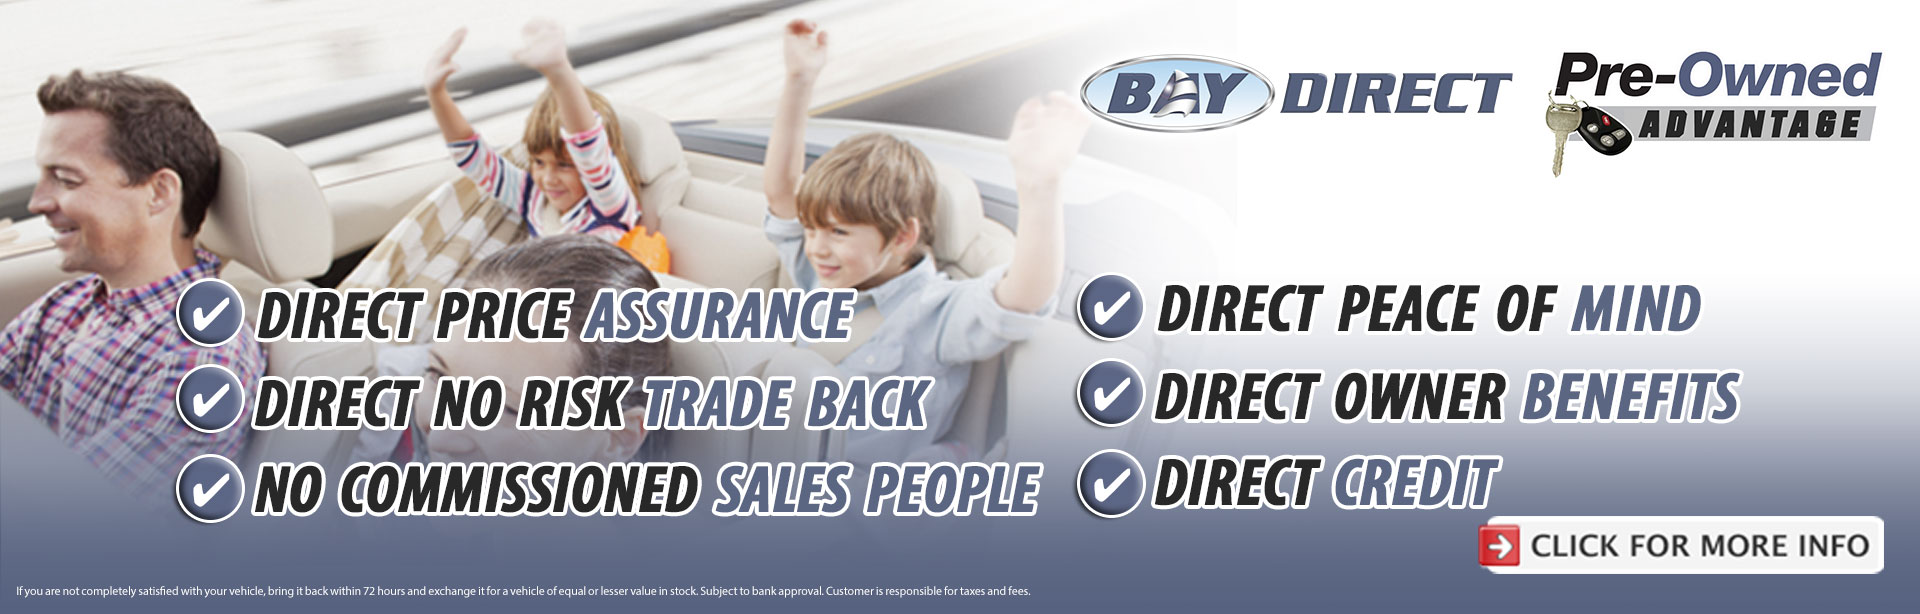 Pre-Owned Advantage - Bay Automotive - Norfolk VA